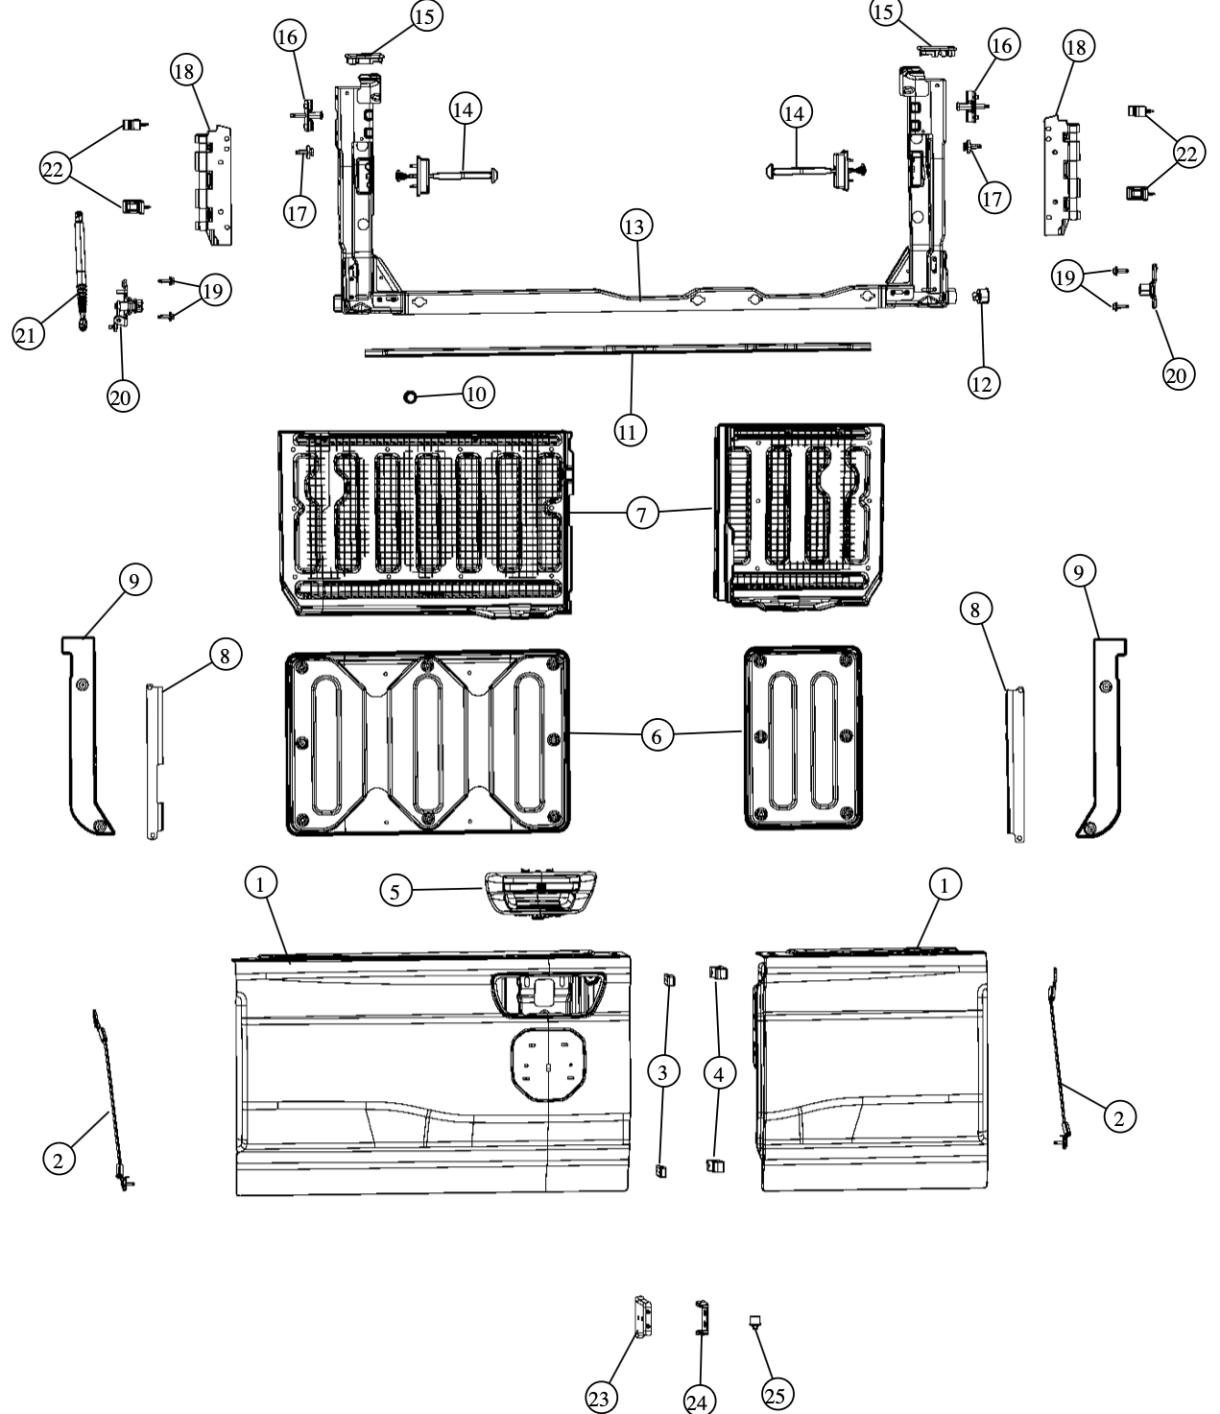 Ram 1500 Multifunction Tailgate Detailed In Parts Diagram